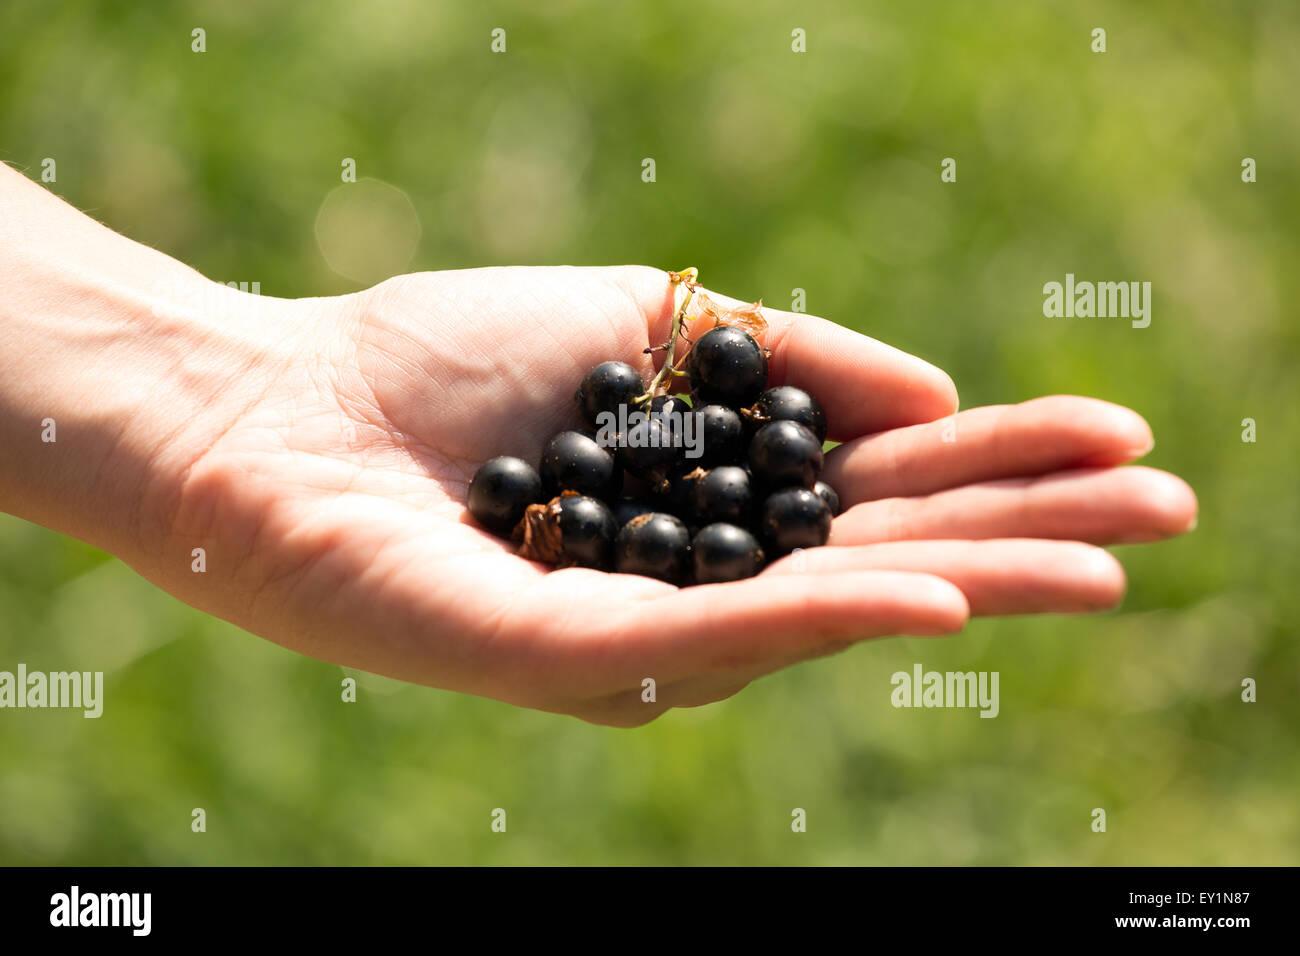 A handful of ripe blackberries in the women's hands - Stock Image